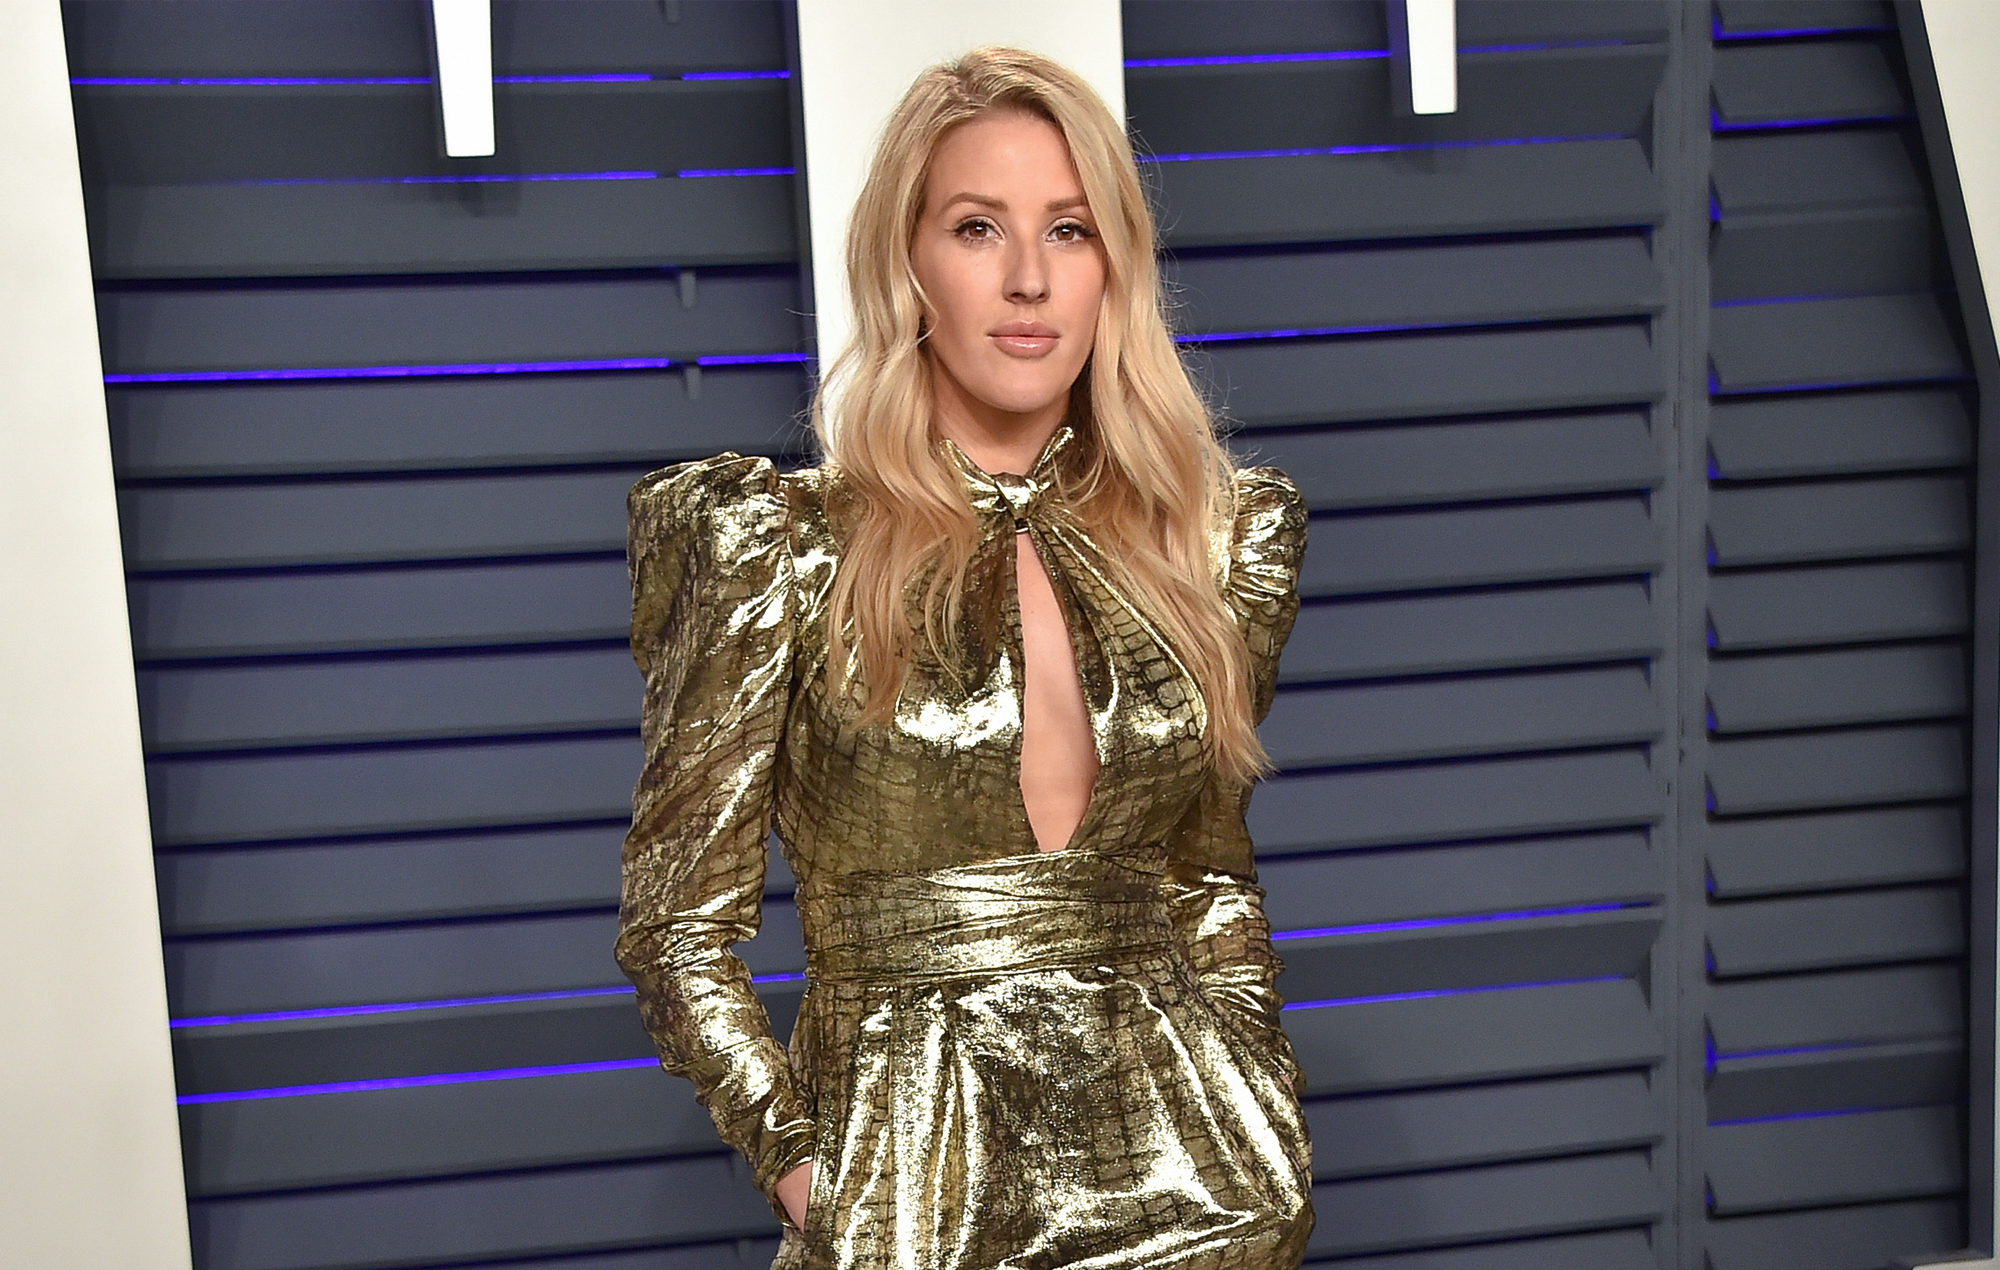 Ellie Goulding at the Vanity Fair Oscar party 2019